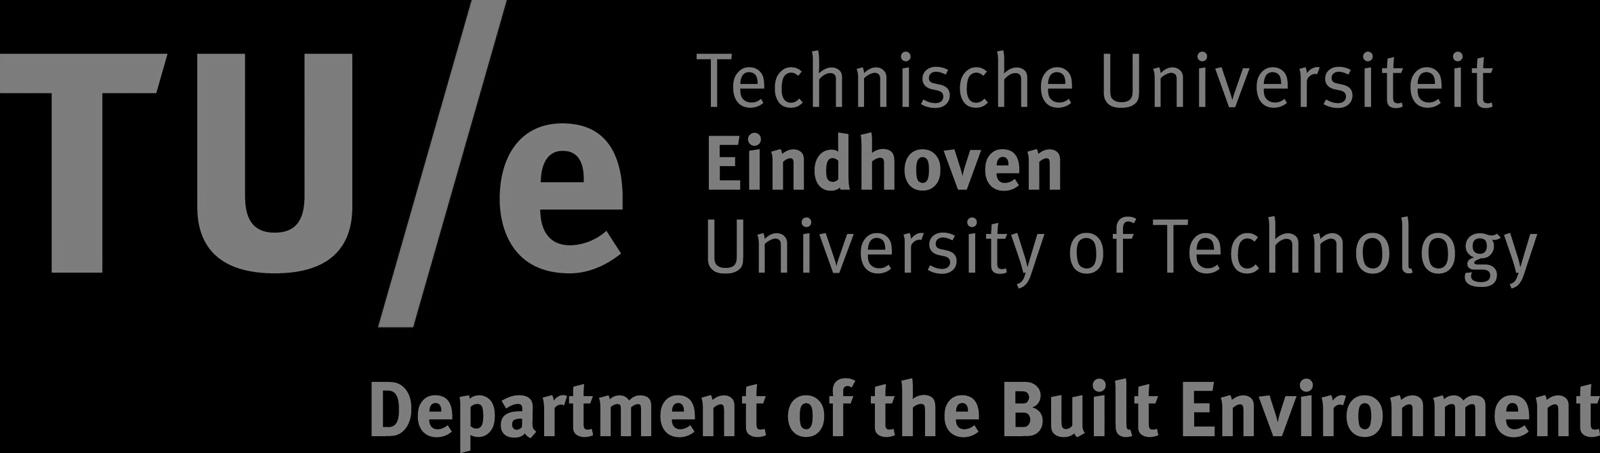 www.tue.nl/universiteit/faculteiten/bouwkunde/